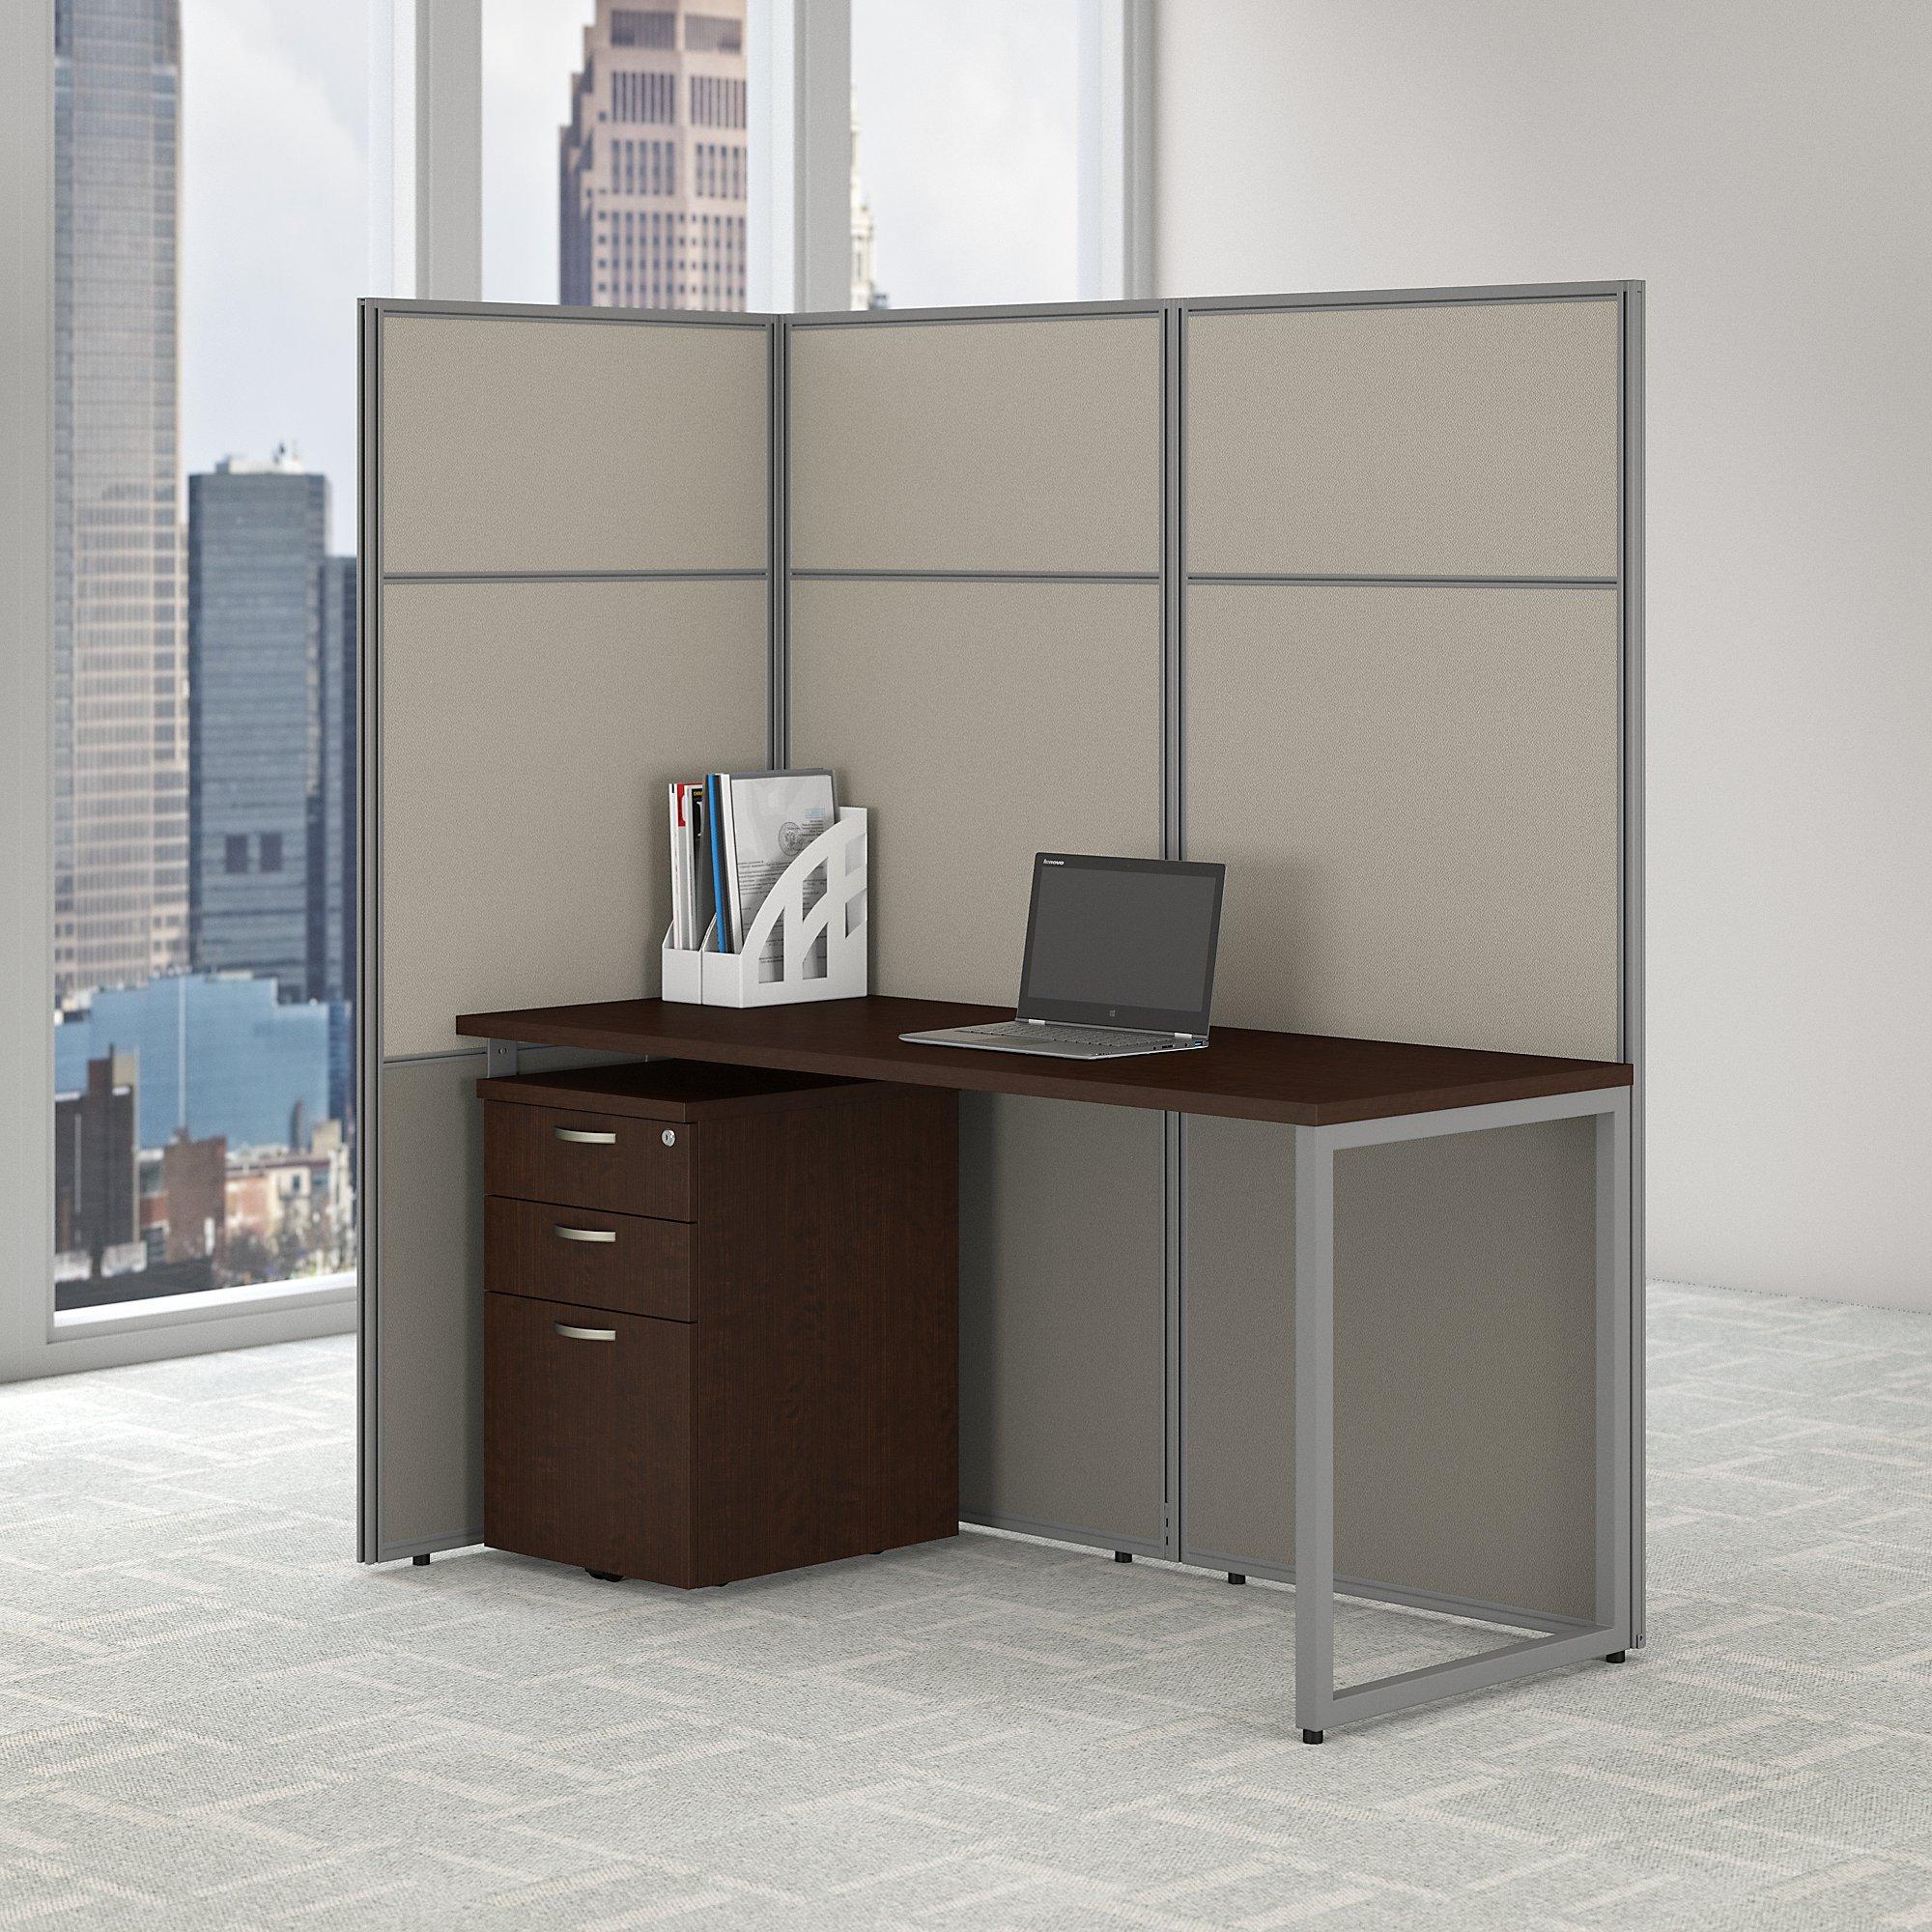 mocha cherry single user cubicle